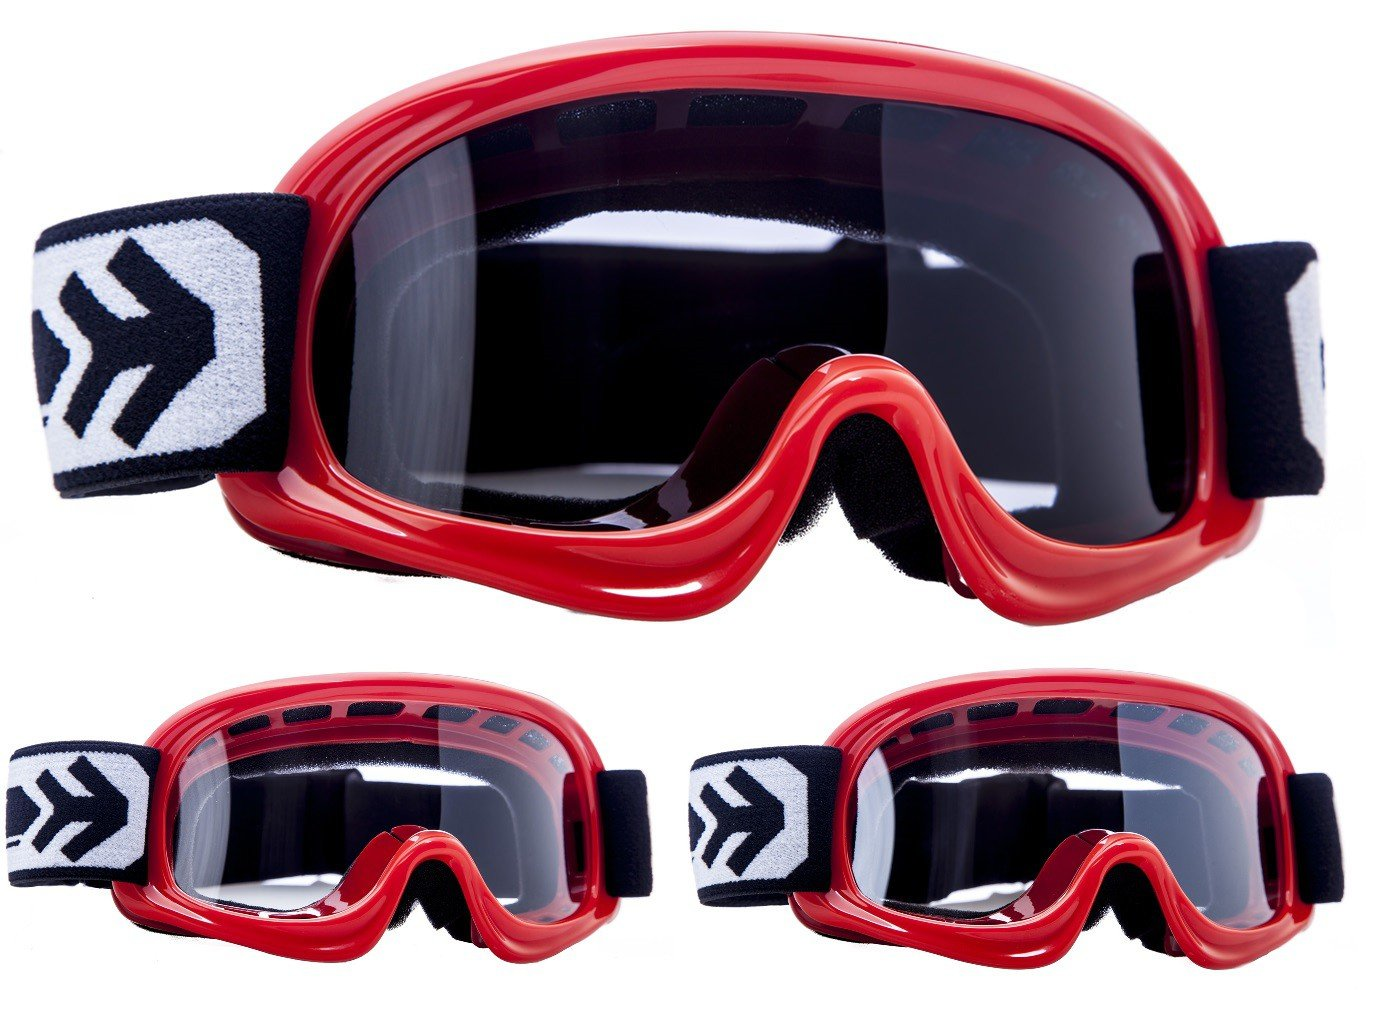 "red Black // Silver // Clear Armor /· AG-49 /""Red/"" /· Cross Enfant /· Cross Lunettes de Protection Masques de Moto Moto MX Windproof Ski /·"